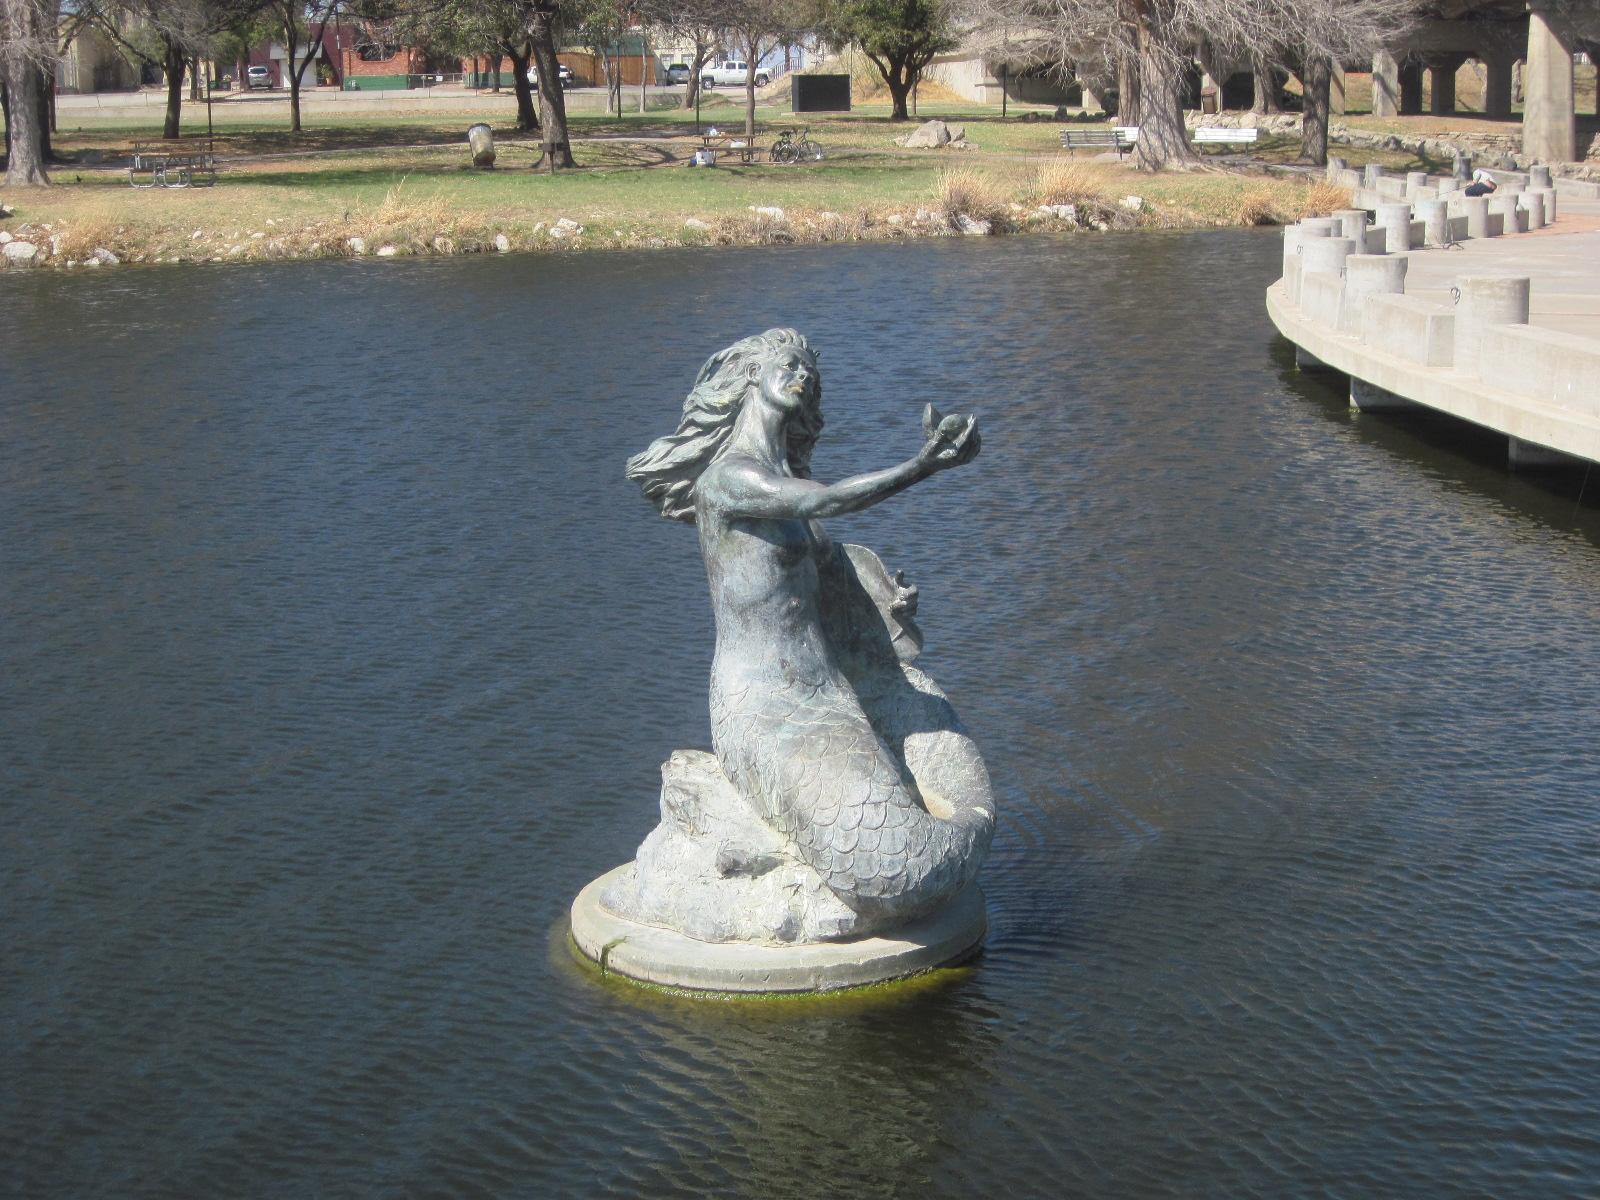 The Schramm Journey: Outdoor art in San Angelo